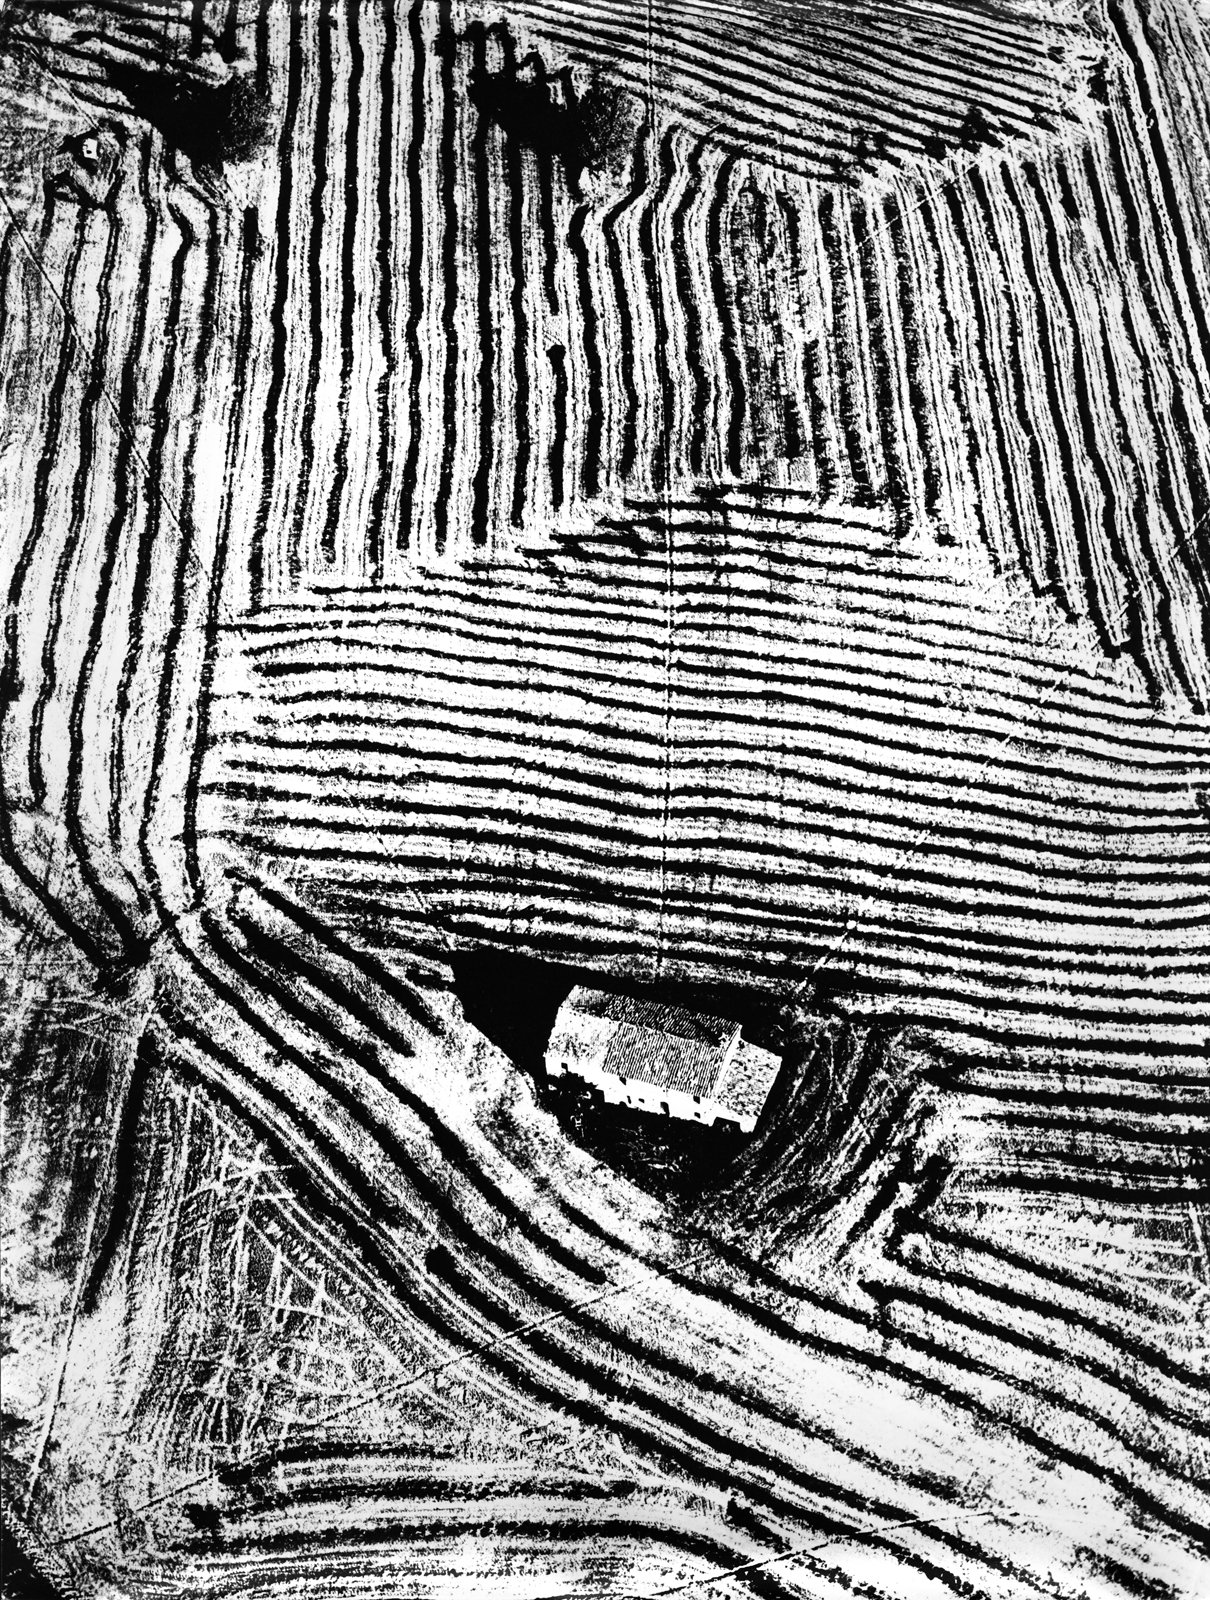 Les paysages graphiques de Mario Giacomelli https://t.co/52TgUGHDAQ